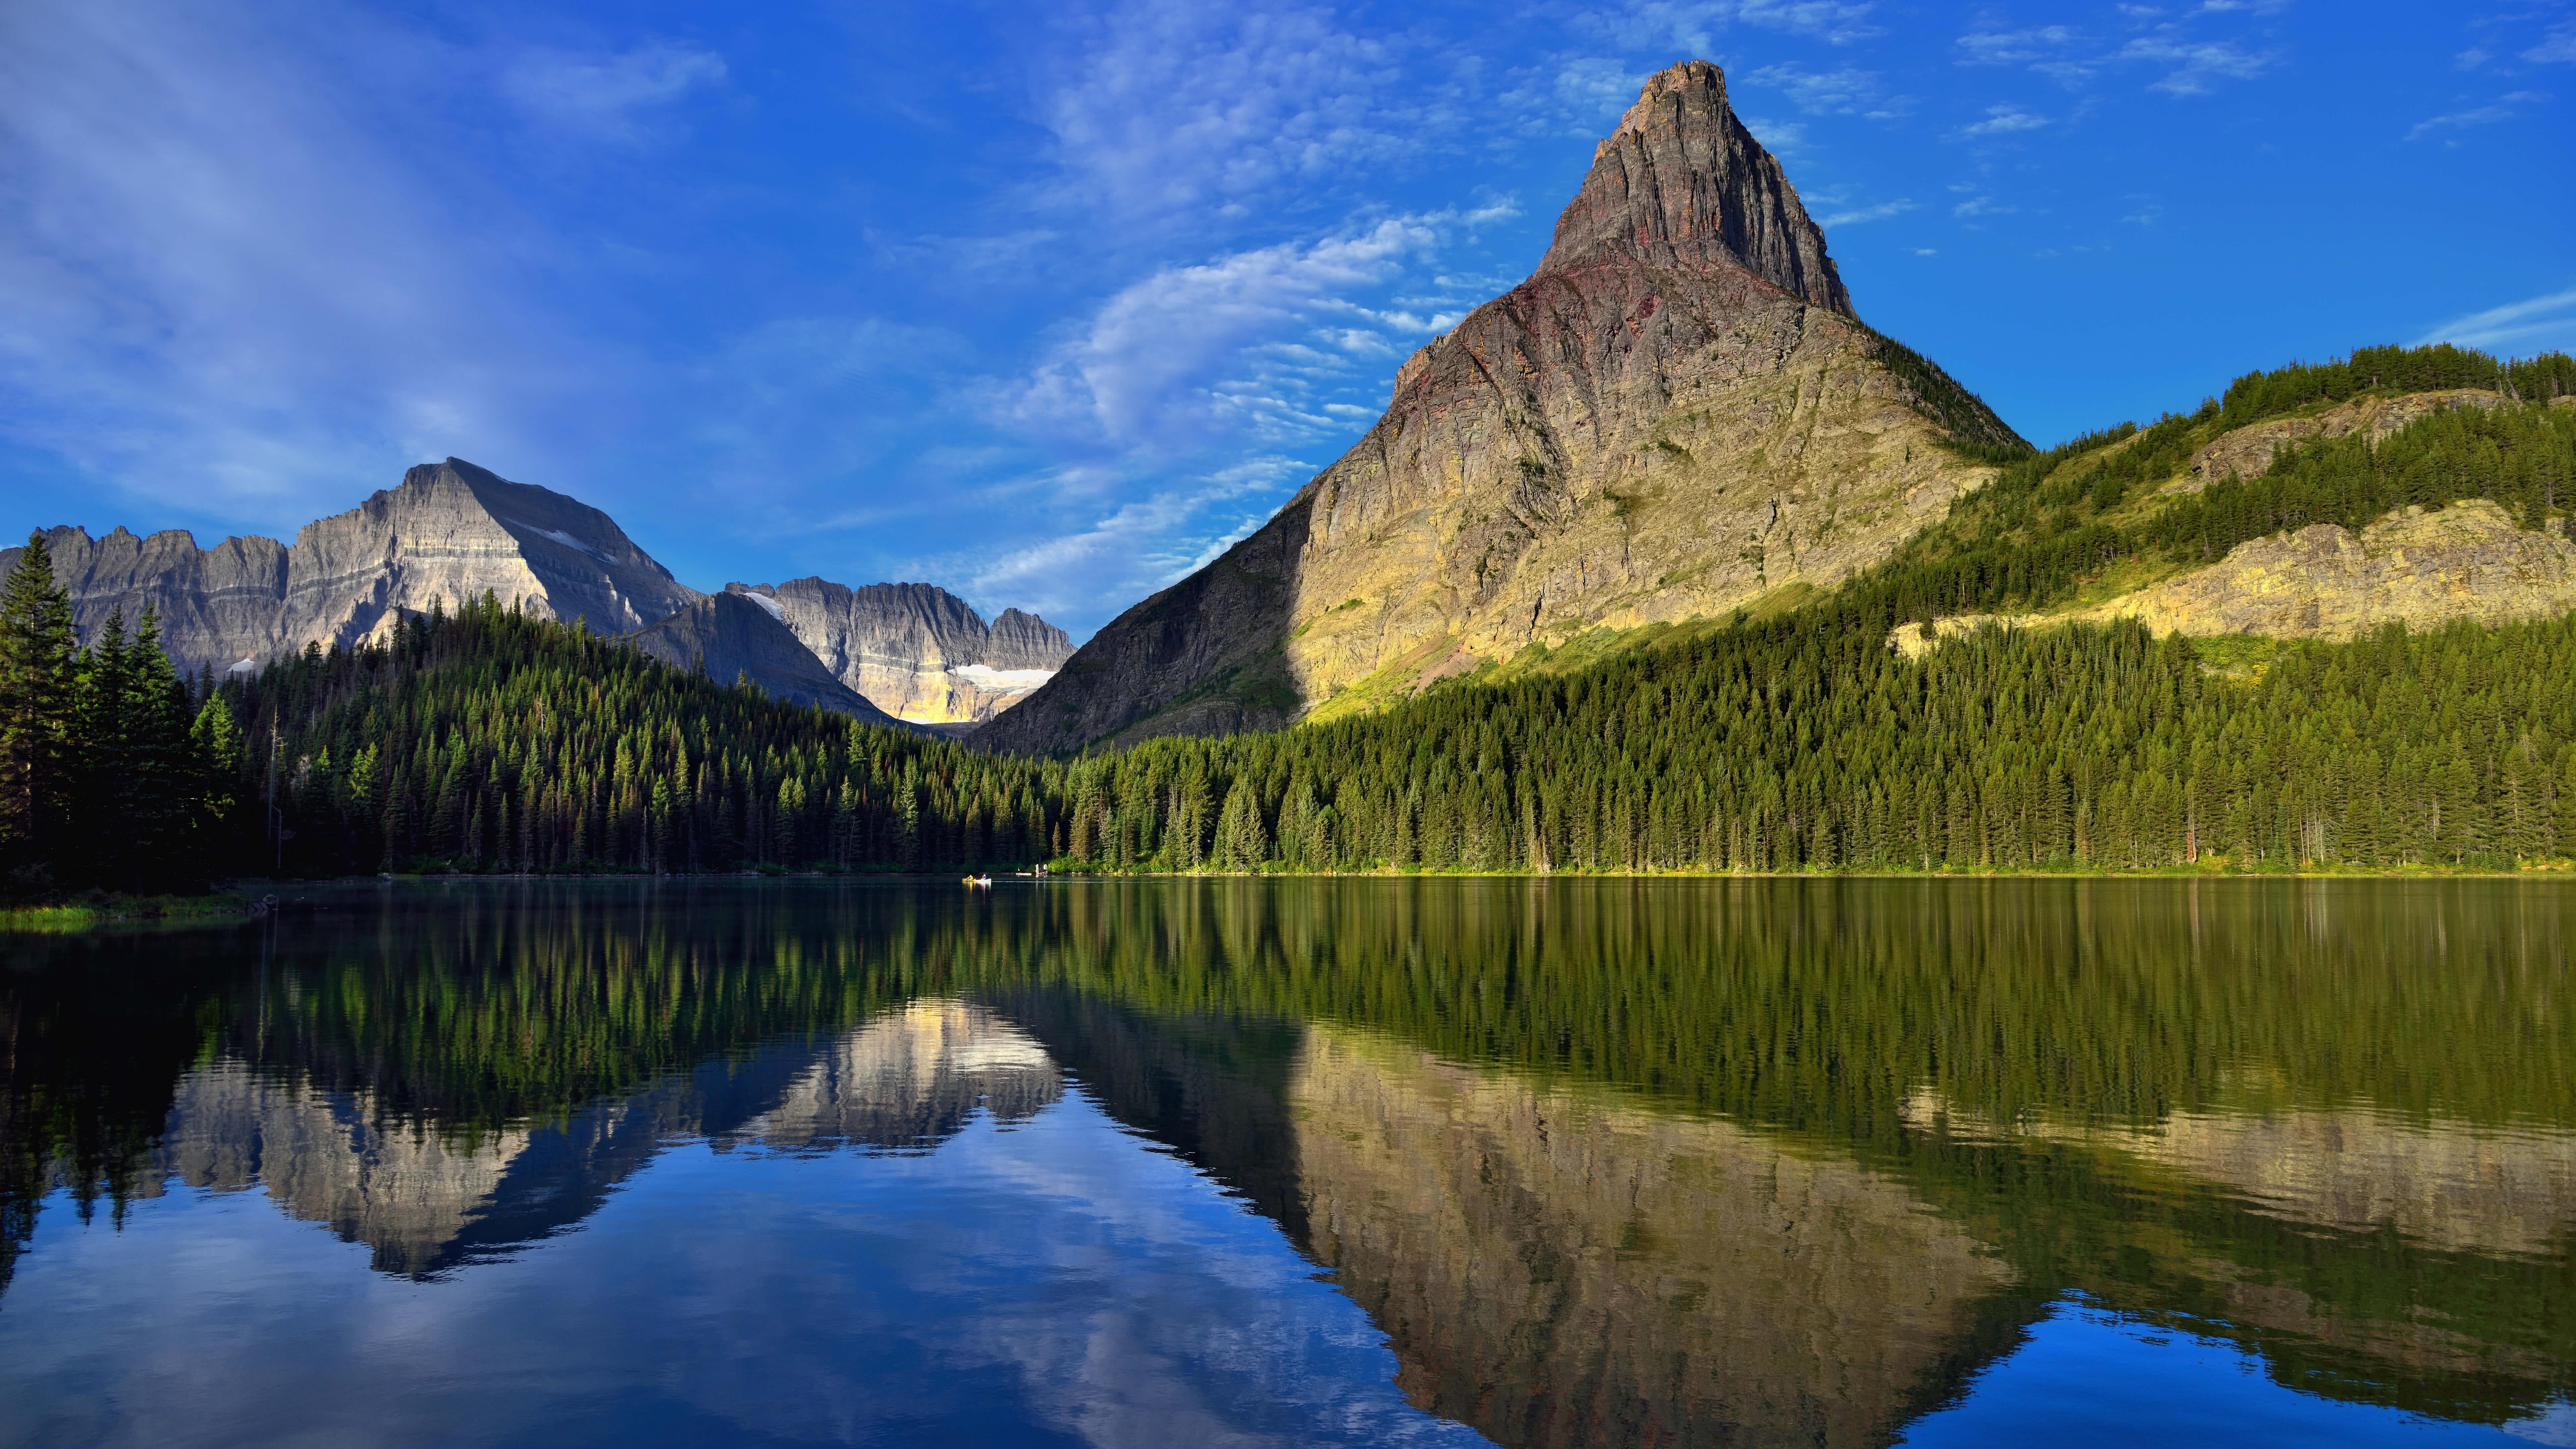 Nature 8k wallpapers top free nature 8k backgrounds - 8k desktop backgrounds ...